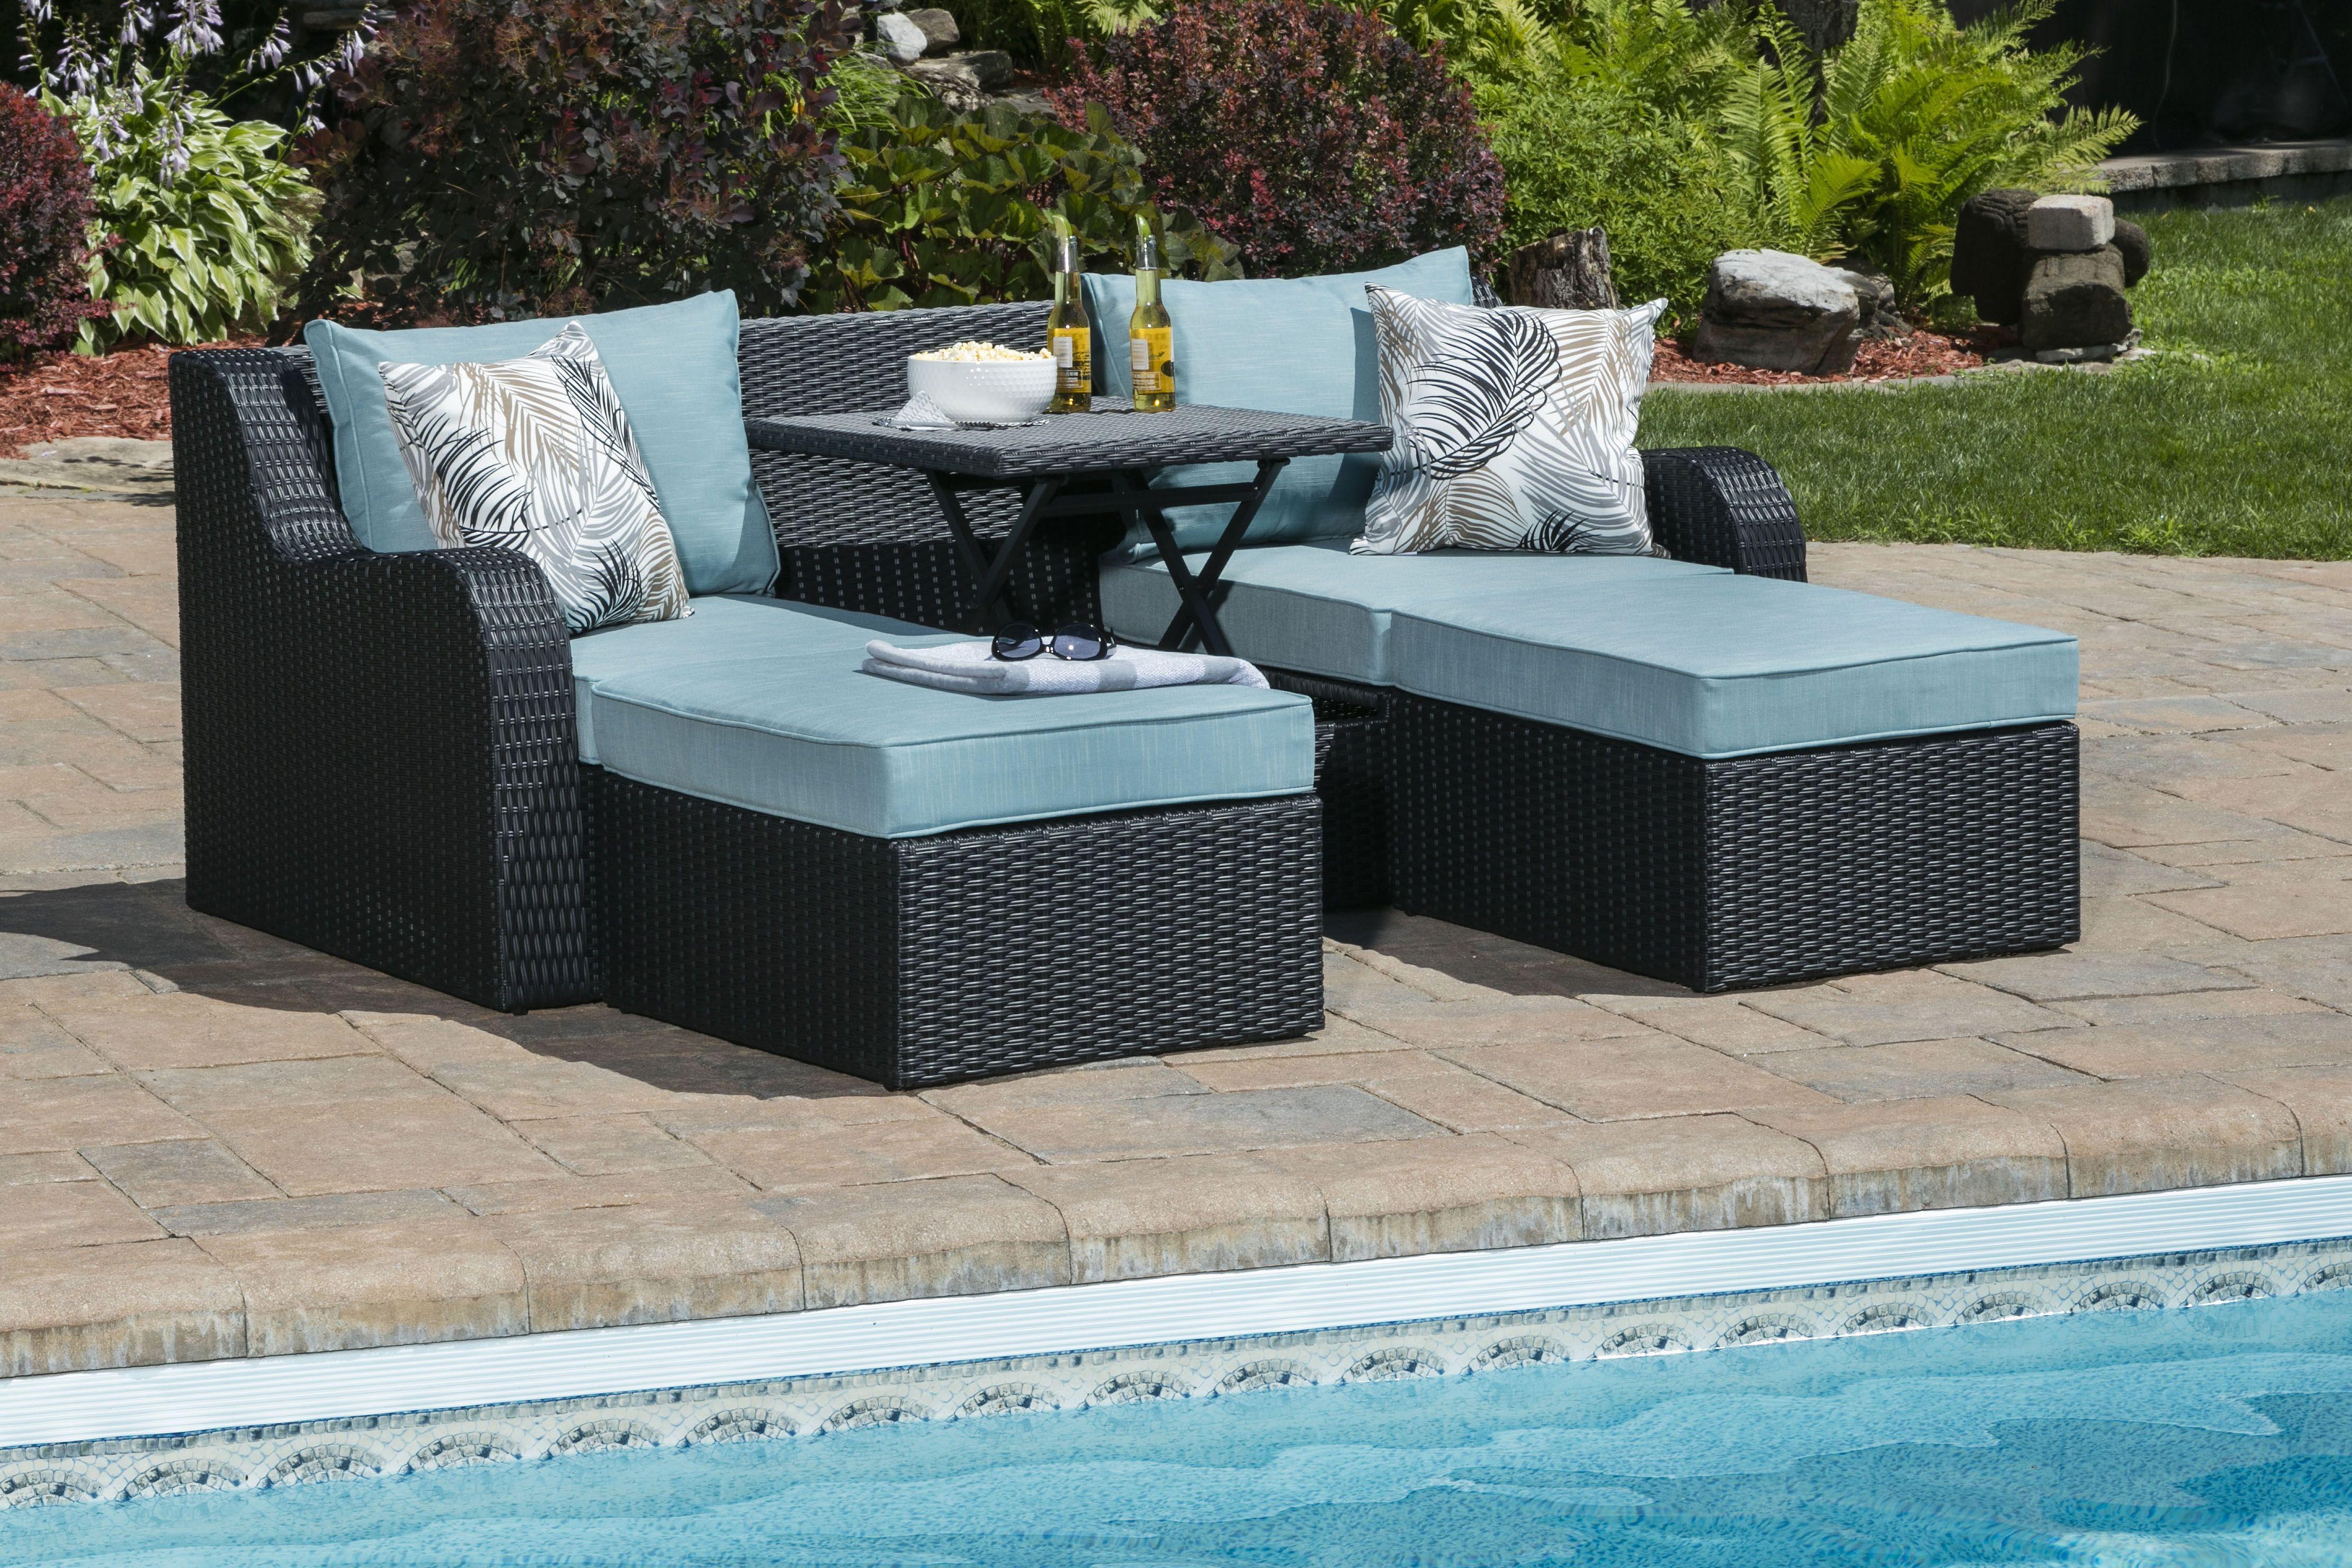 Divan Convertible Exterieur Belleville Outdoor Convertible Sofa Patio Furniture Furniture Outdoor Furniture